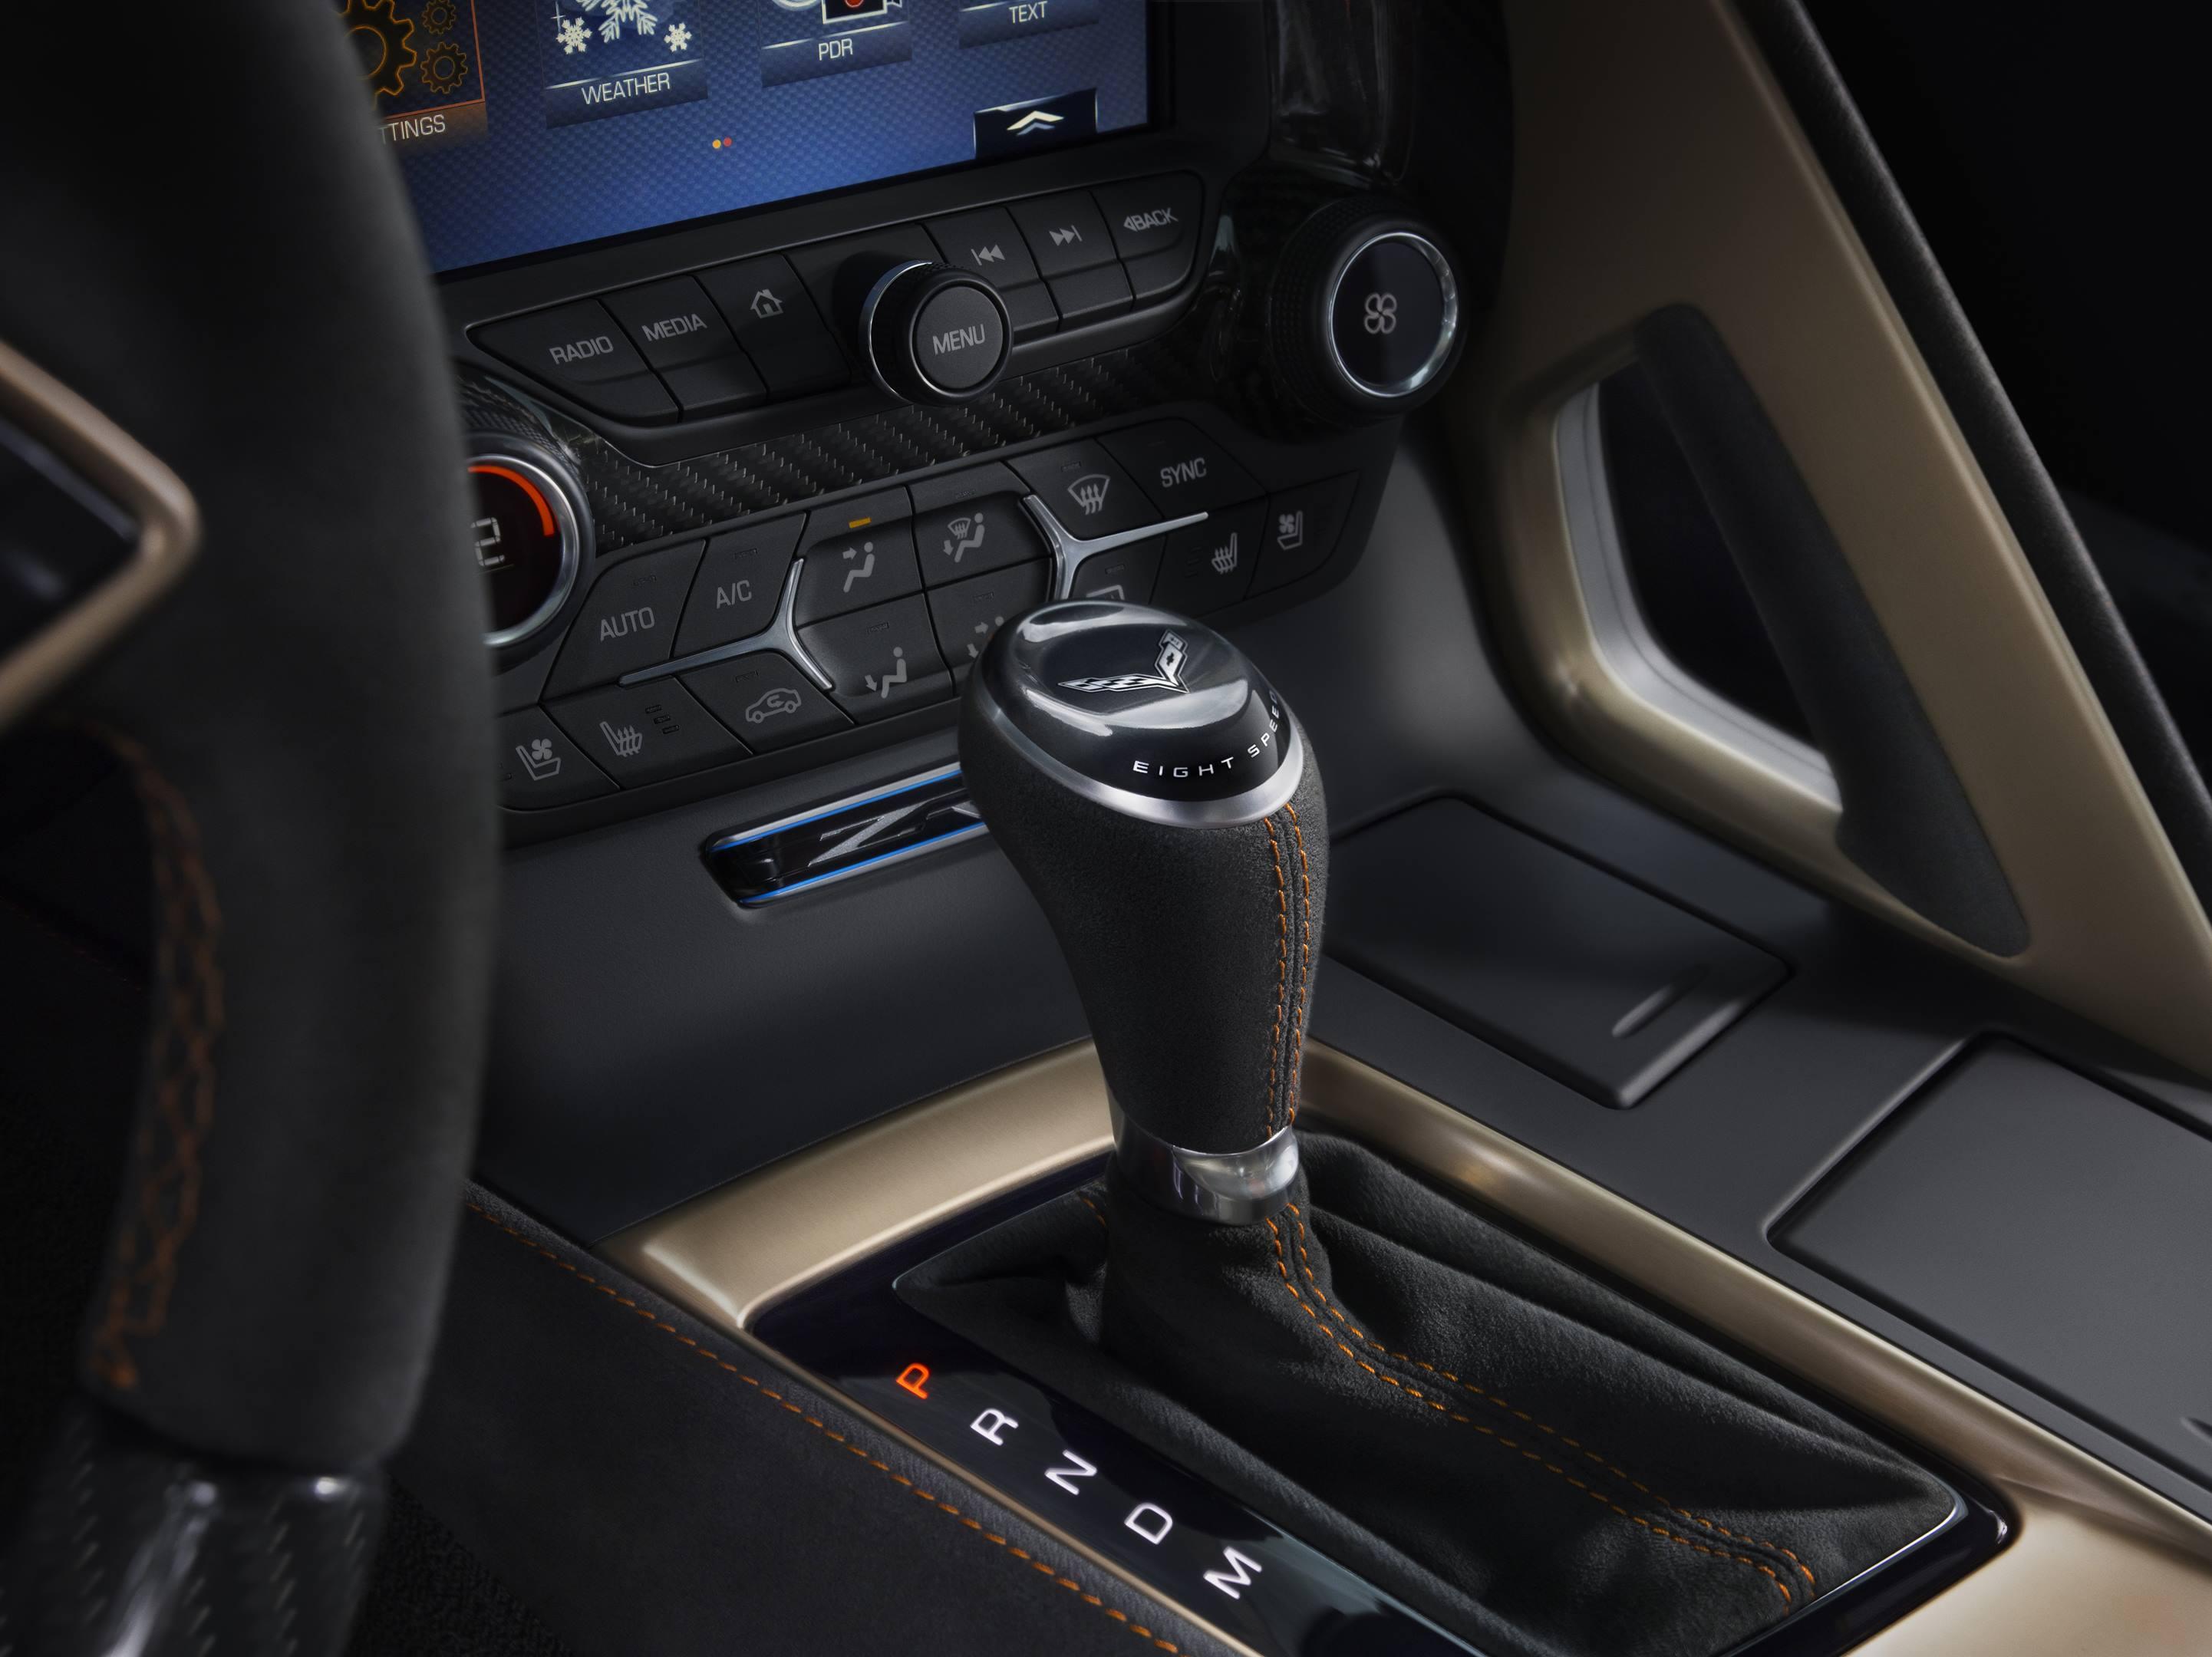 2019 Chevrolet Corvette ZR1 Shifter Console Shot